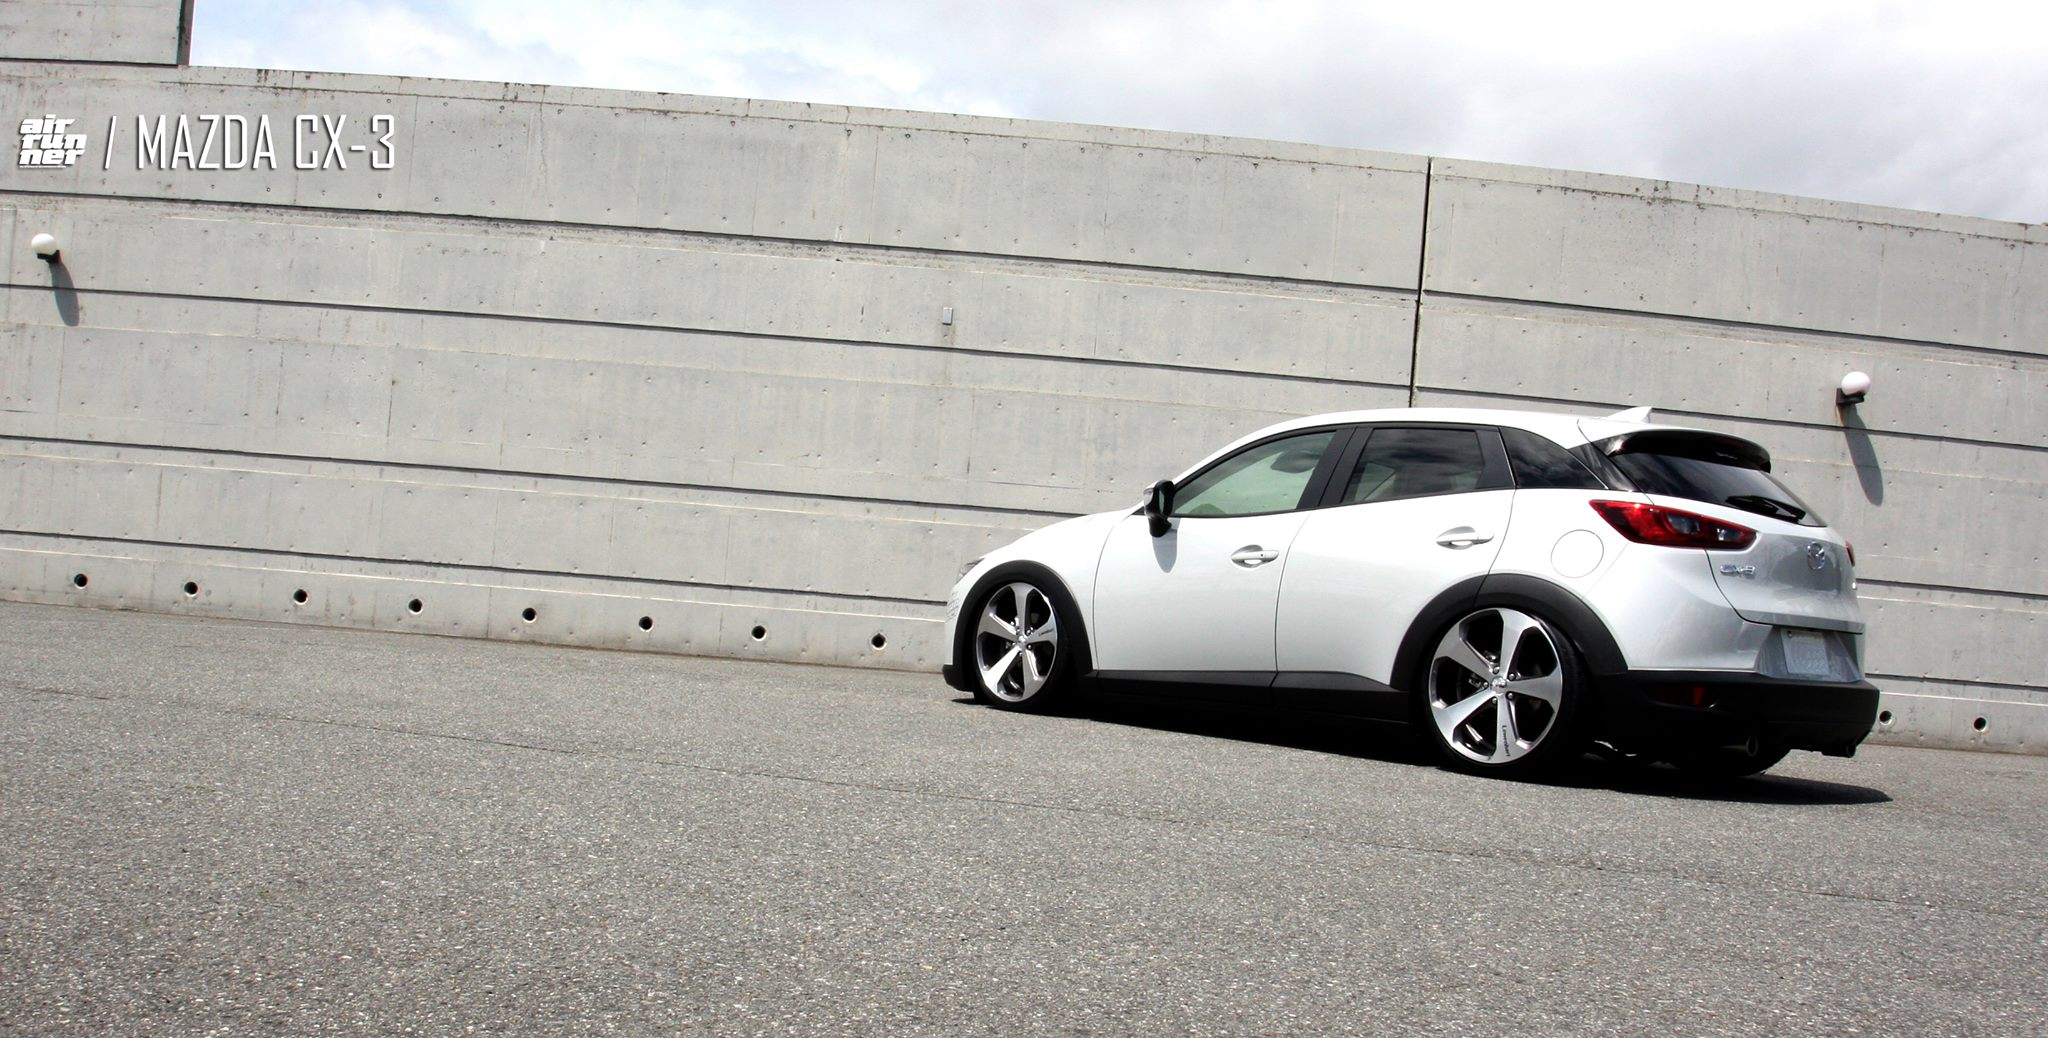 Mazda CX-3 Air Runner Lowered on Lowenhart LV5 Wheels ...